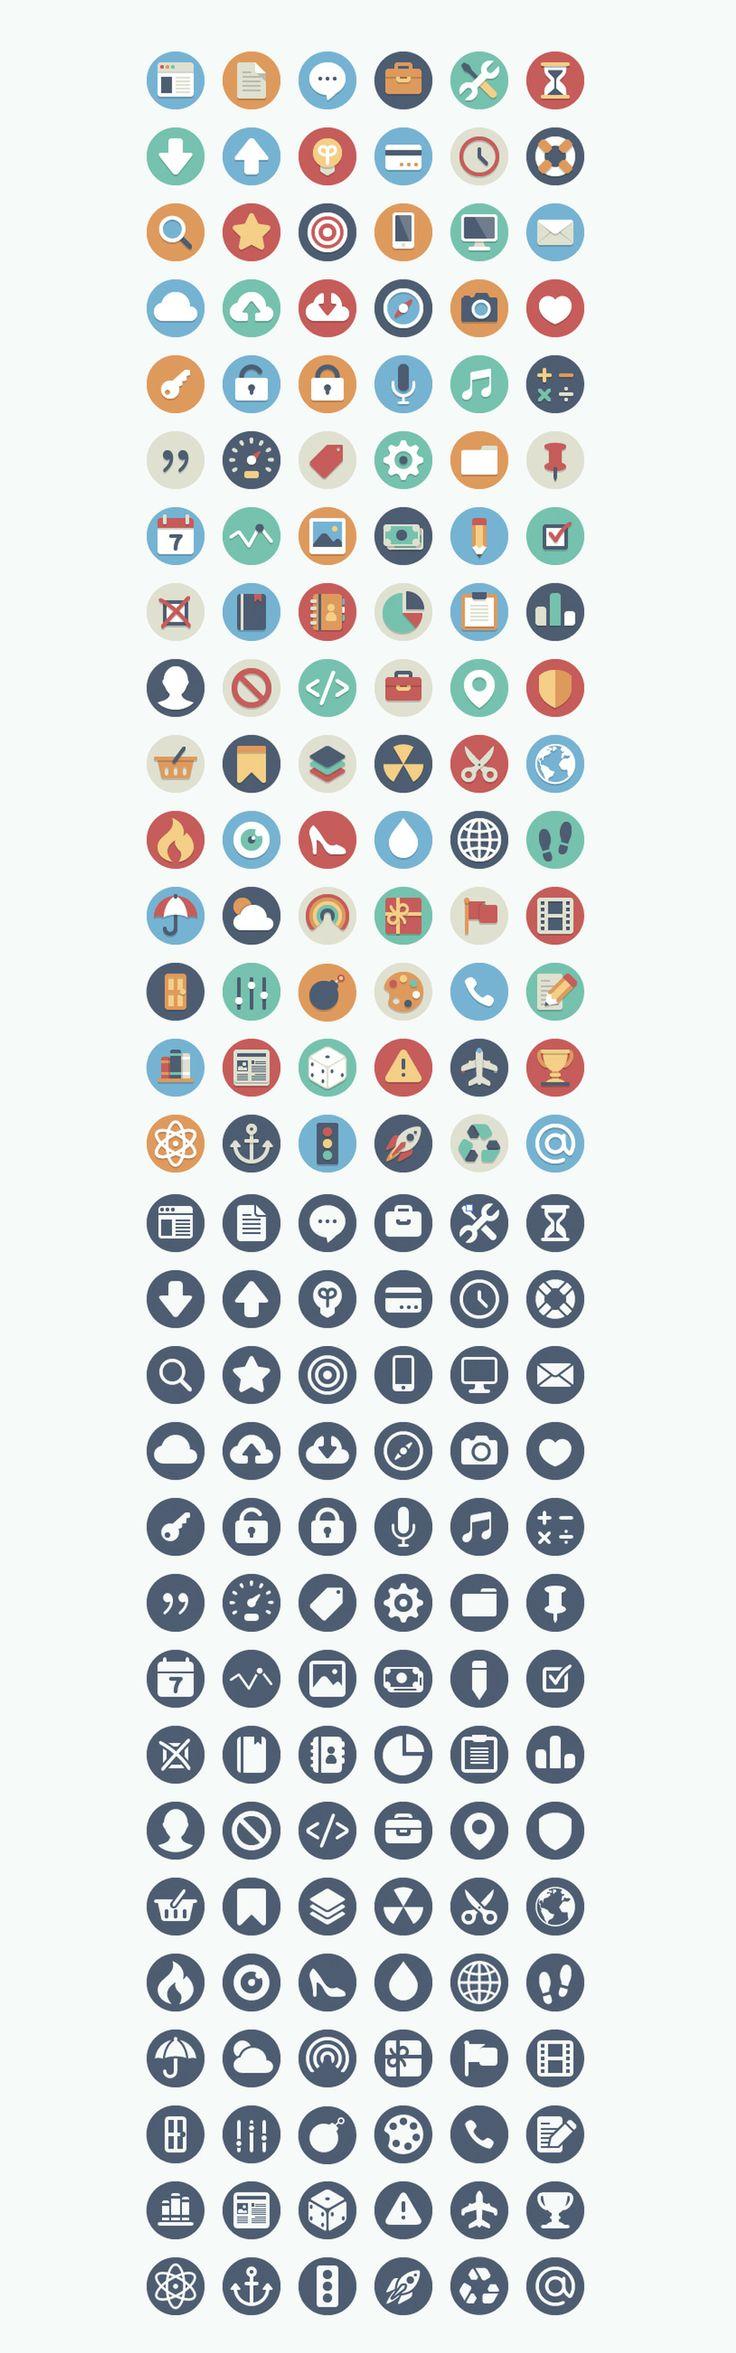 #Free Flat Icons